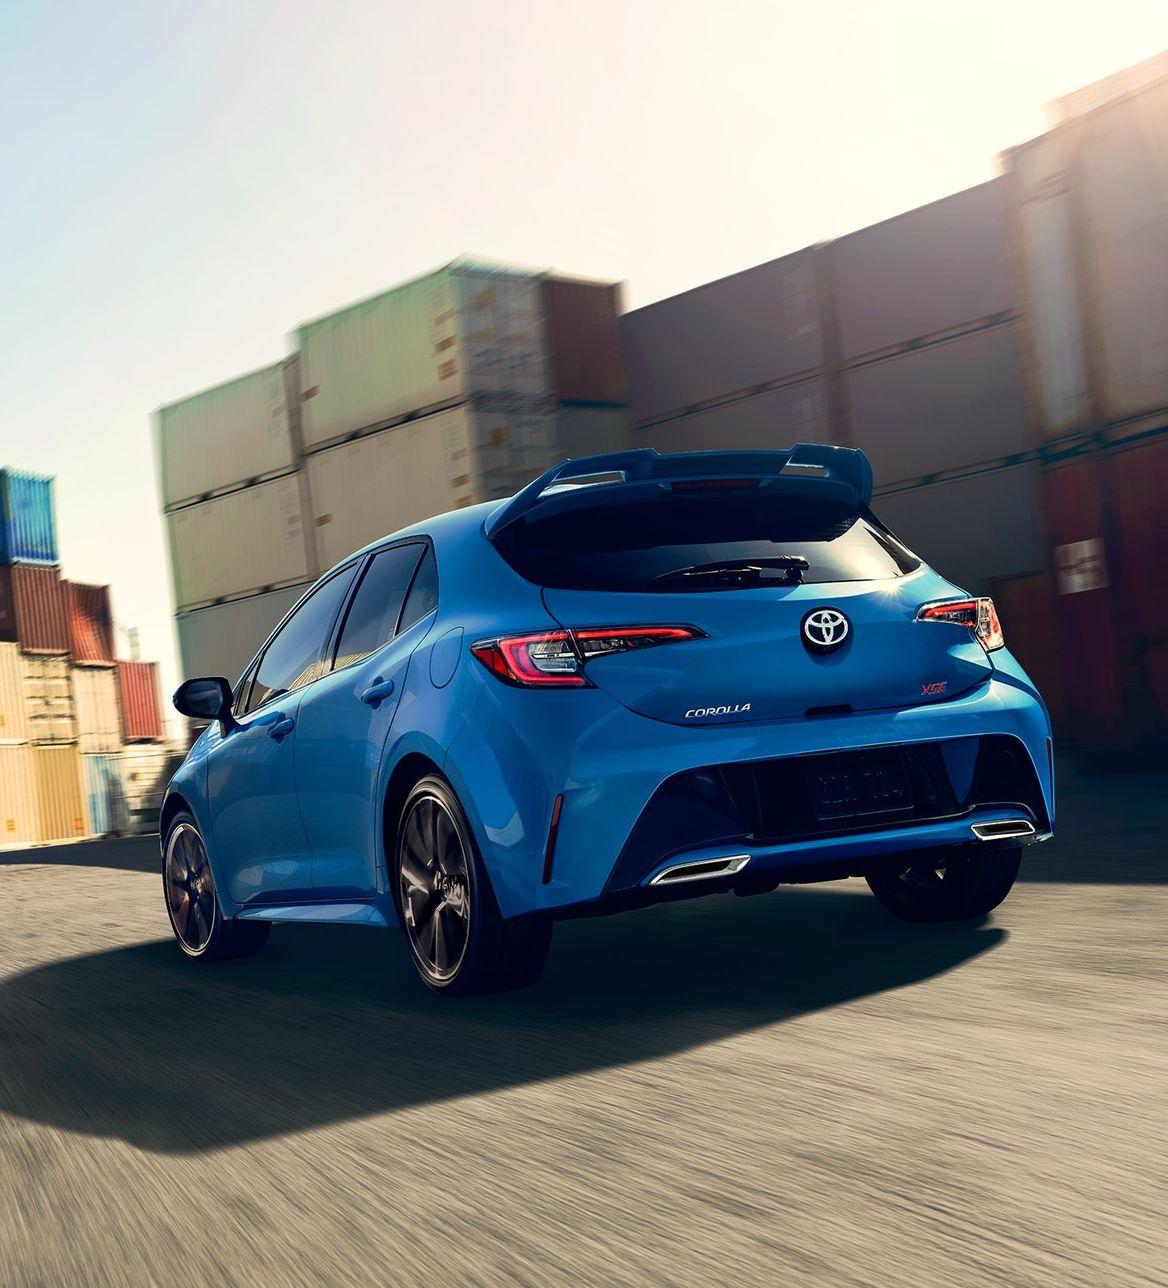 2019 Toyota Corolla Hatchback for Sale near Olathe, KS, 66051